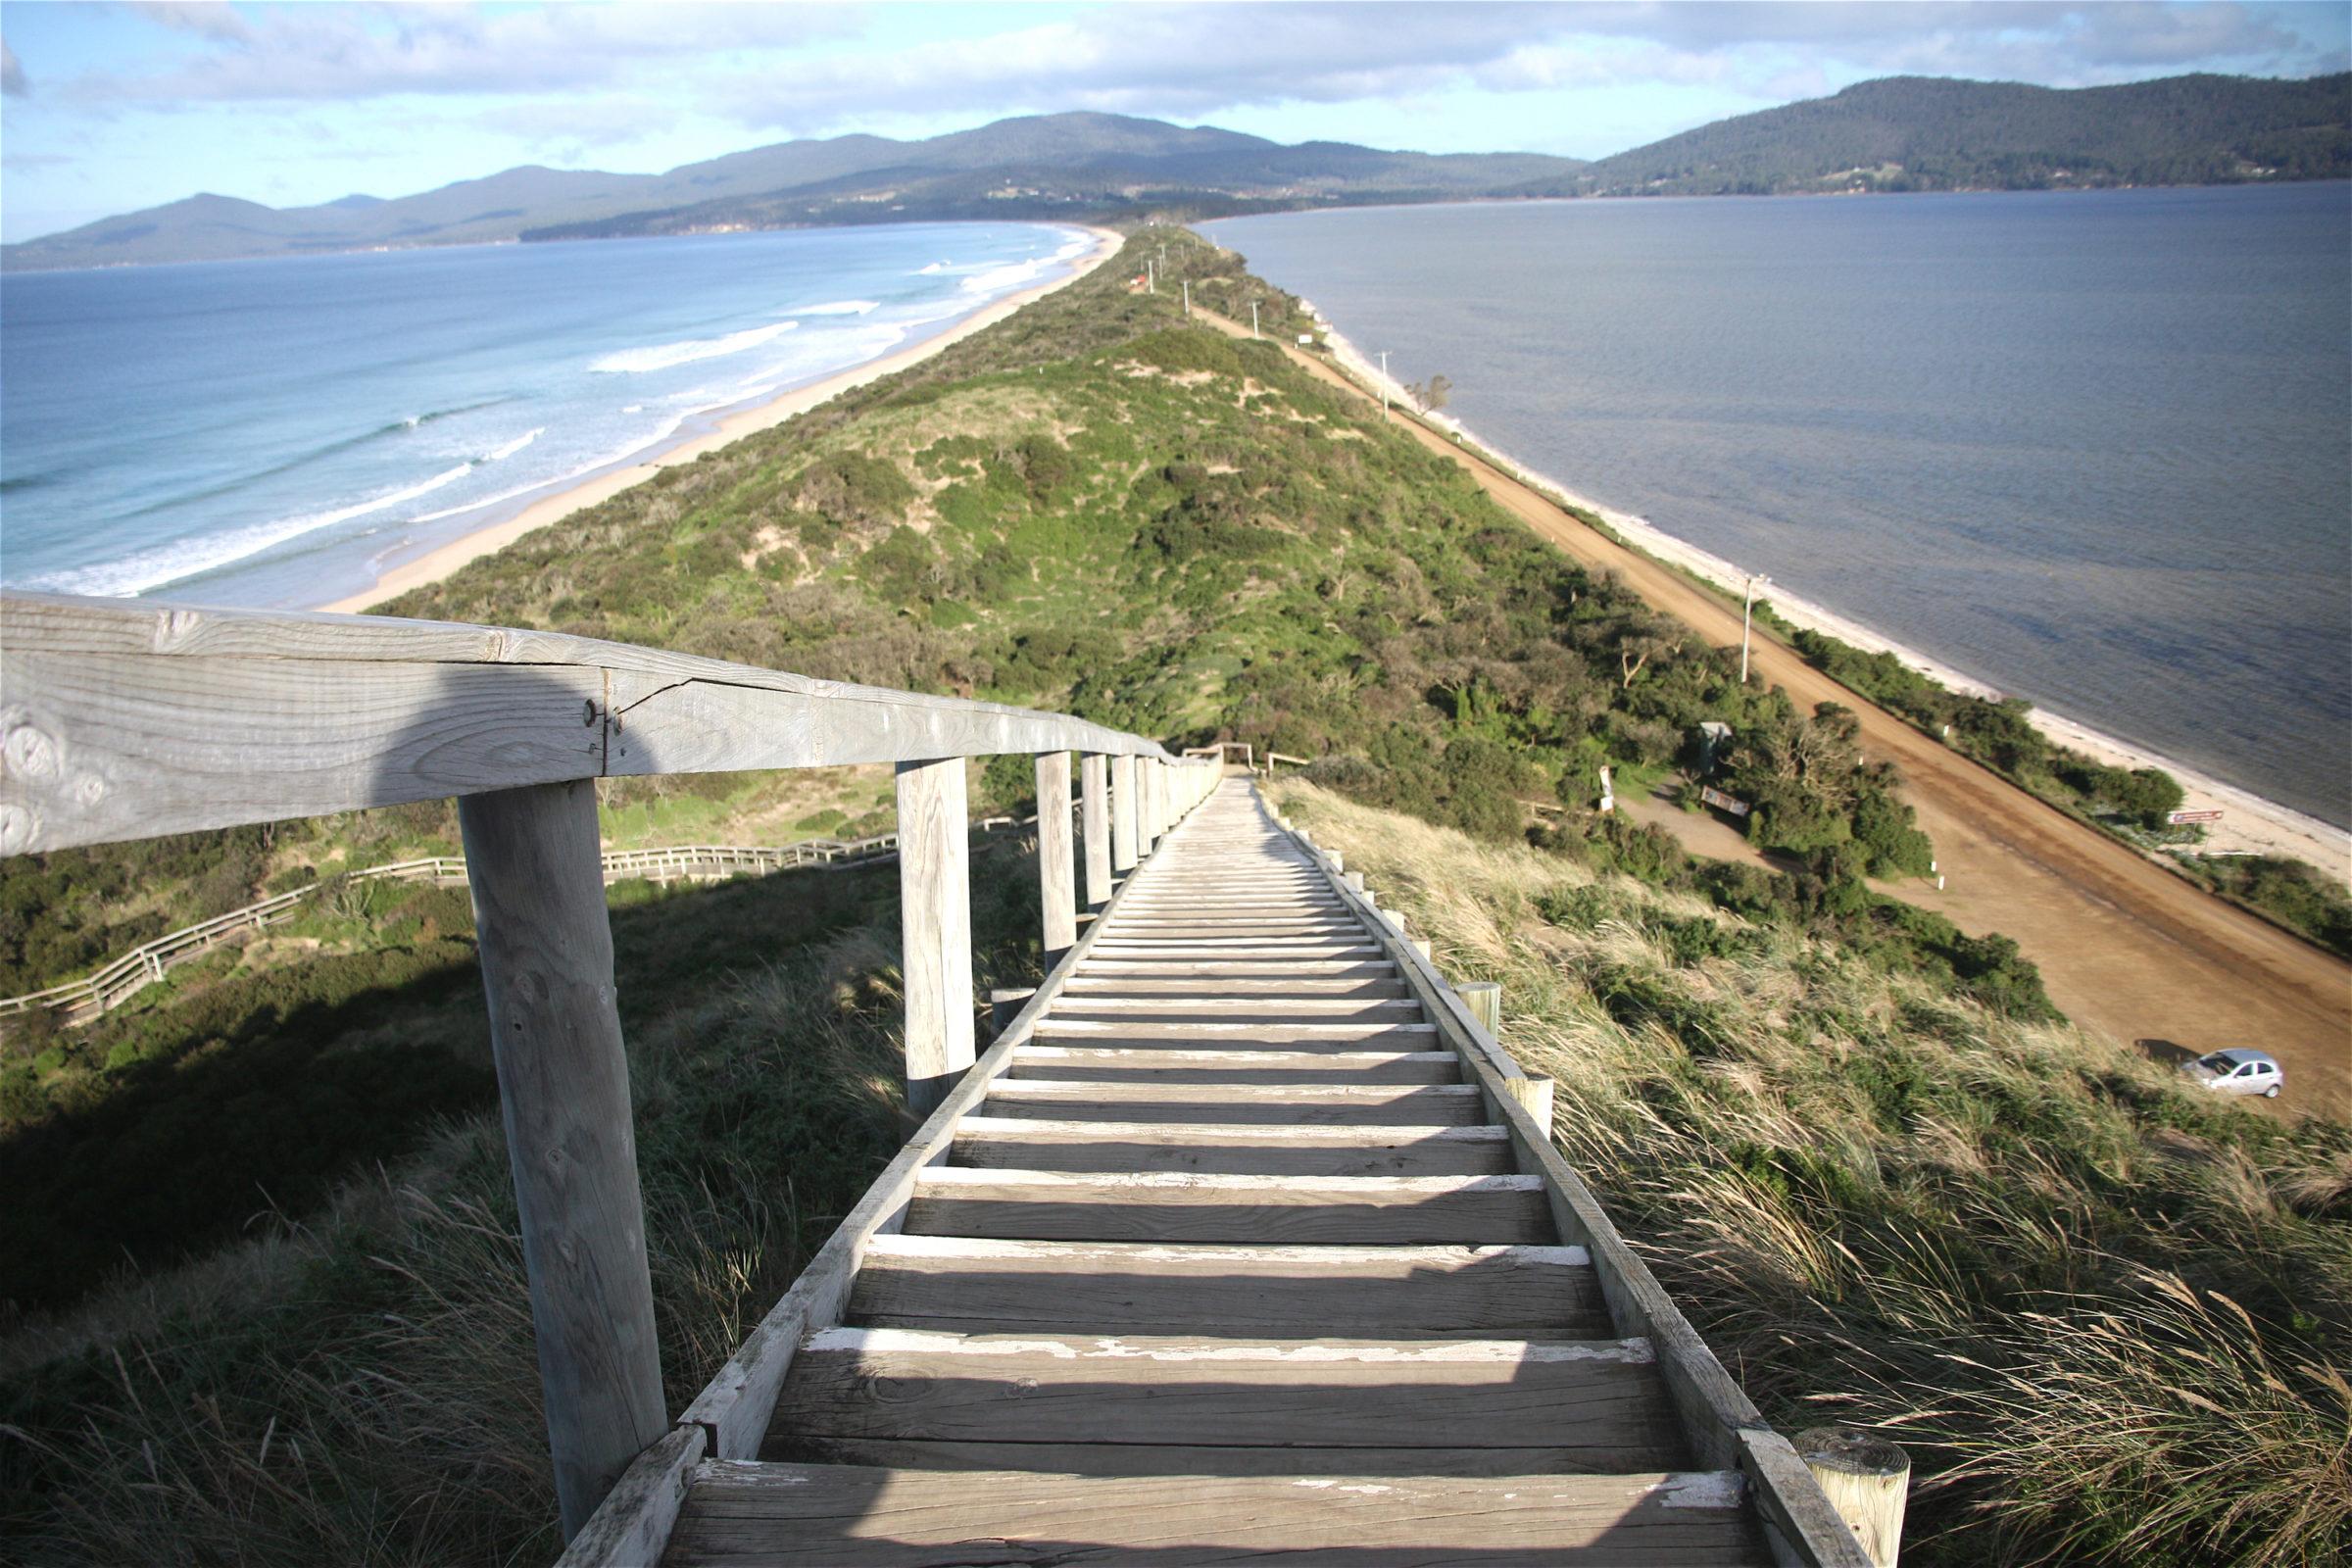 Tasmania Road Trip Itinerary, Day 2: Bruny Island